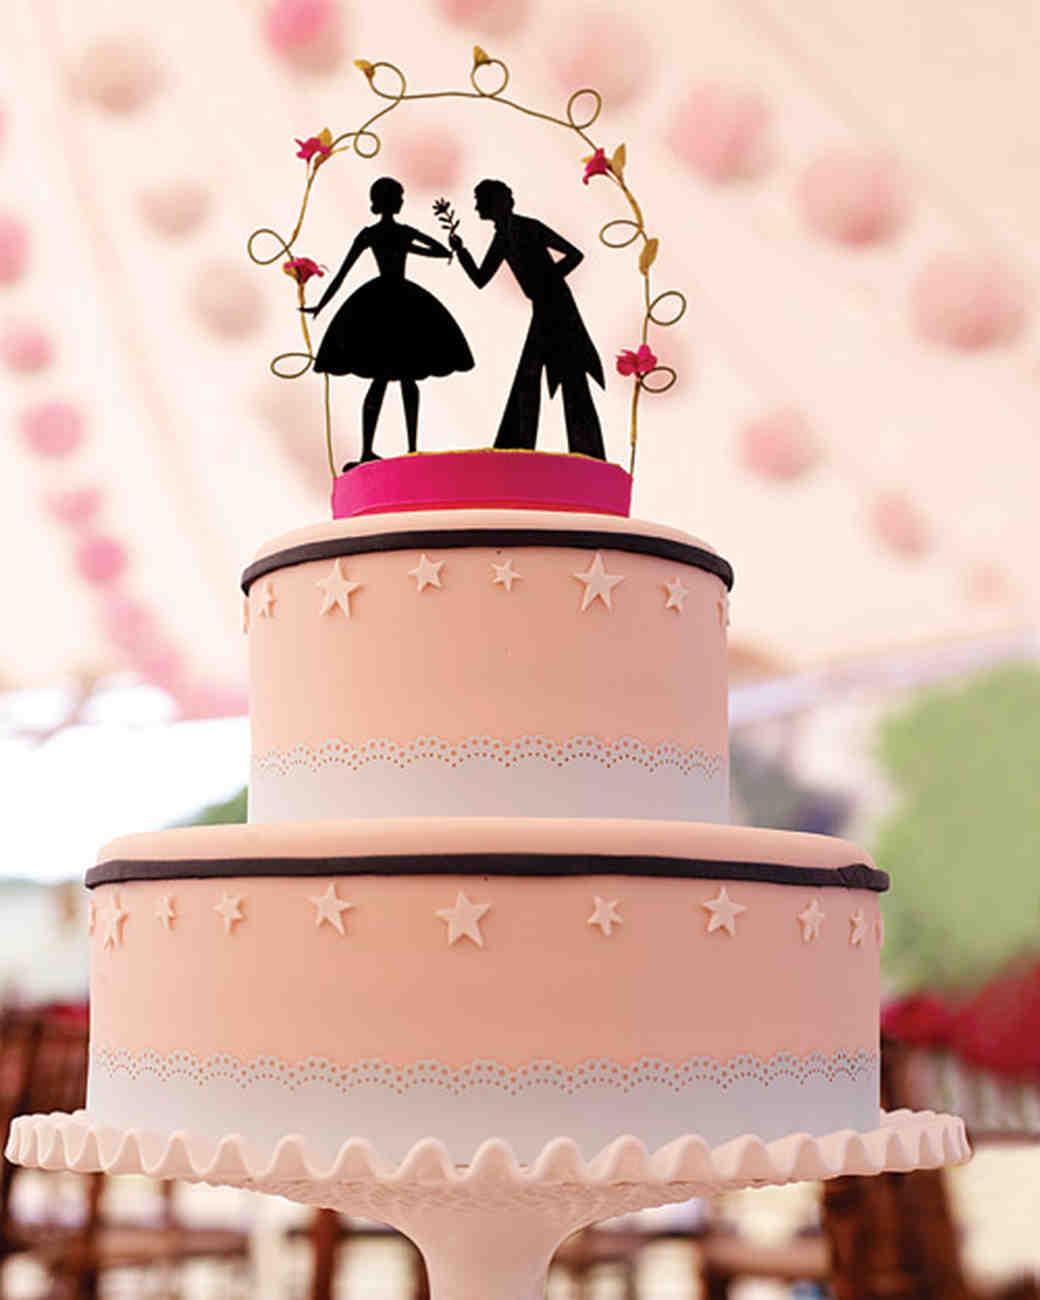 mwd104892_spr10_25_cake_1158.jpg